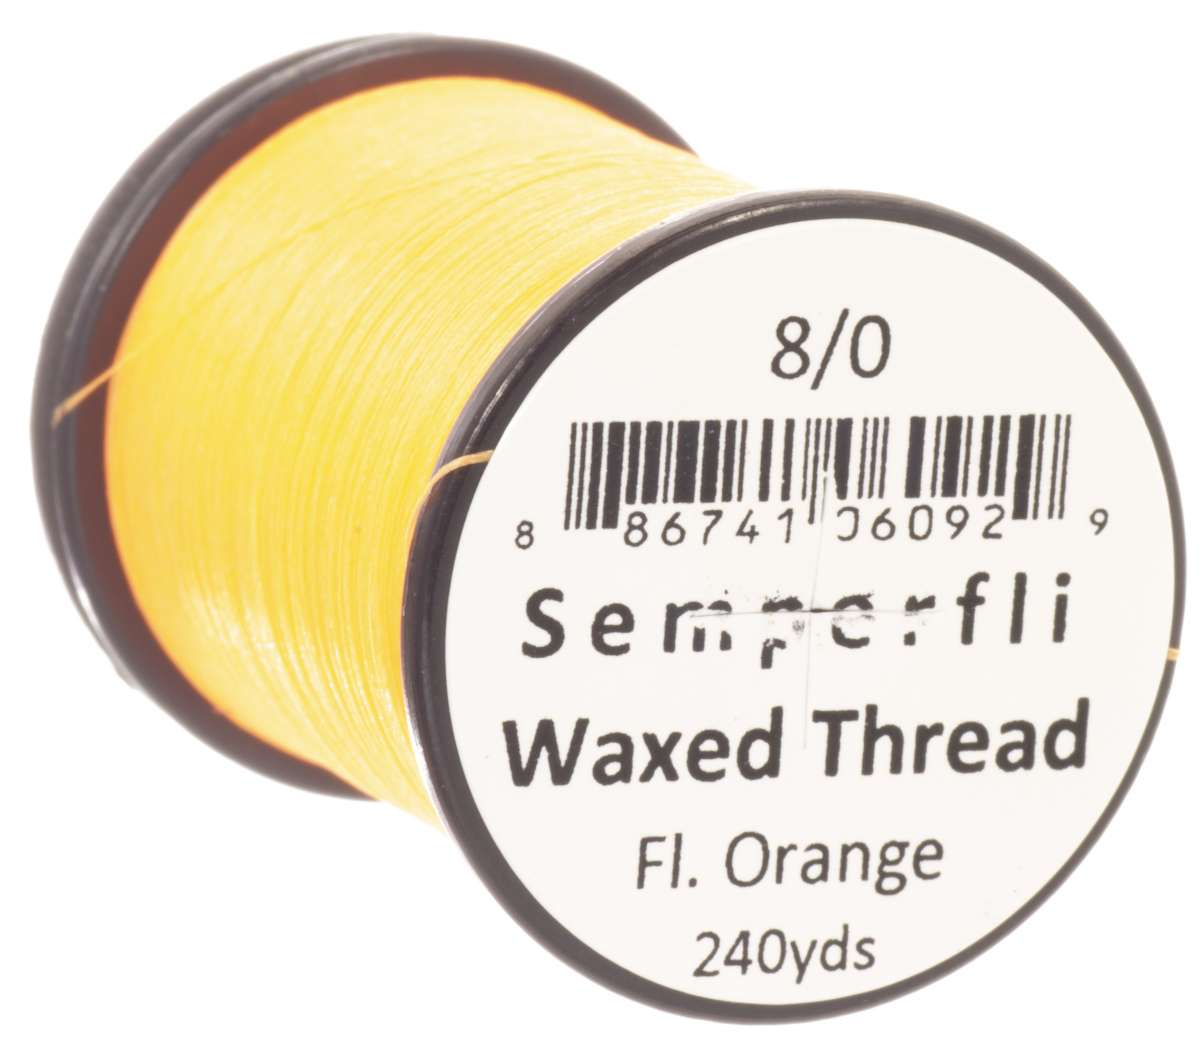 8/0 Classic Waxed Fluoro Orange Sem-0400-1871